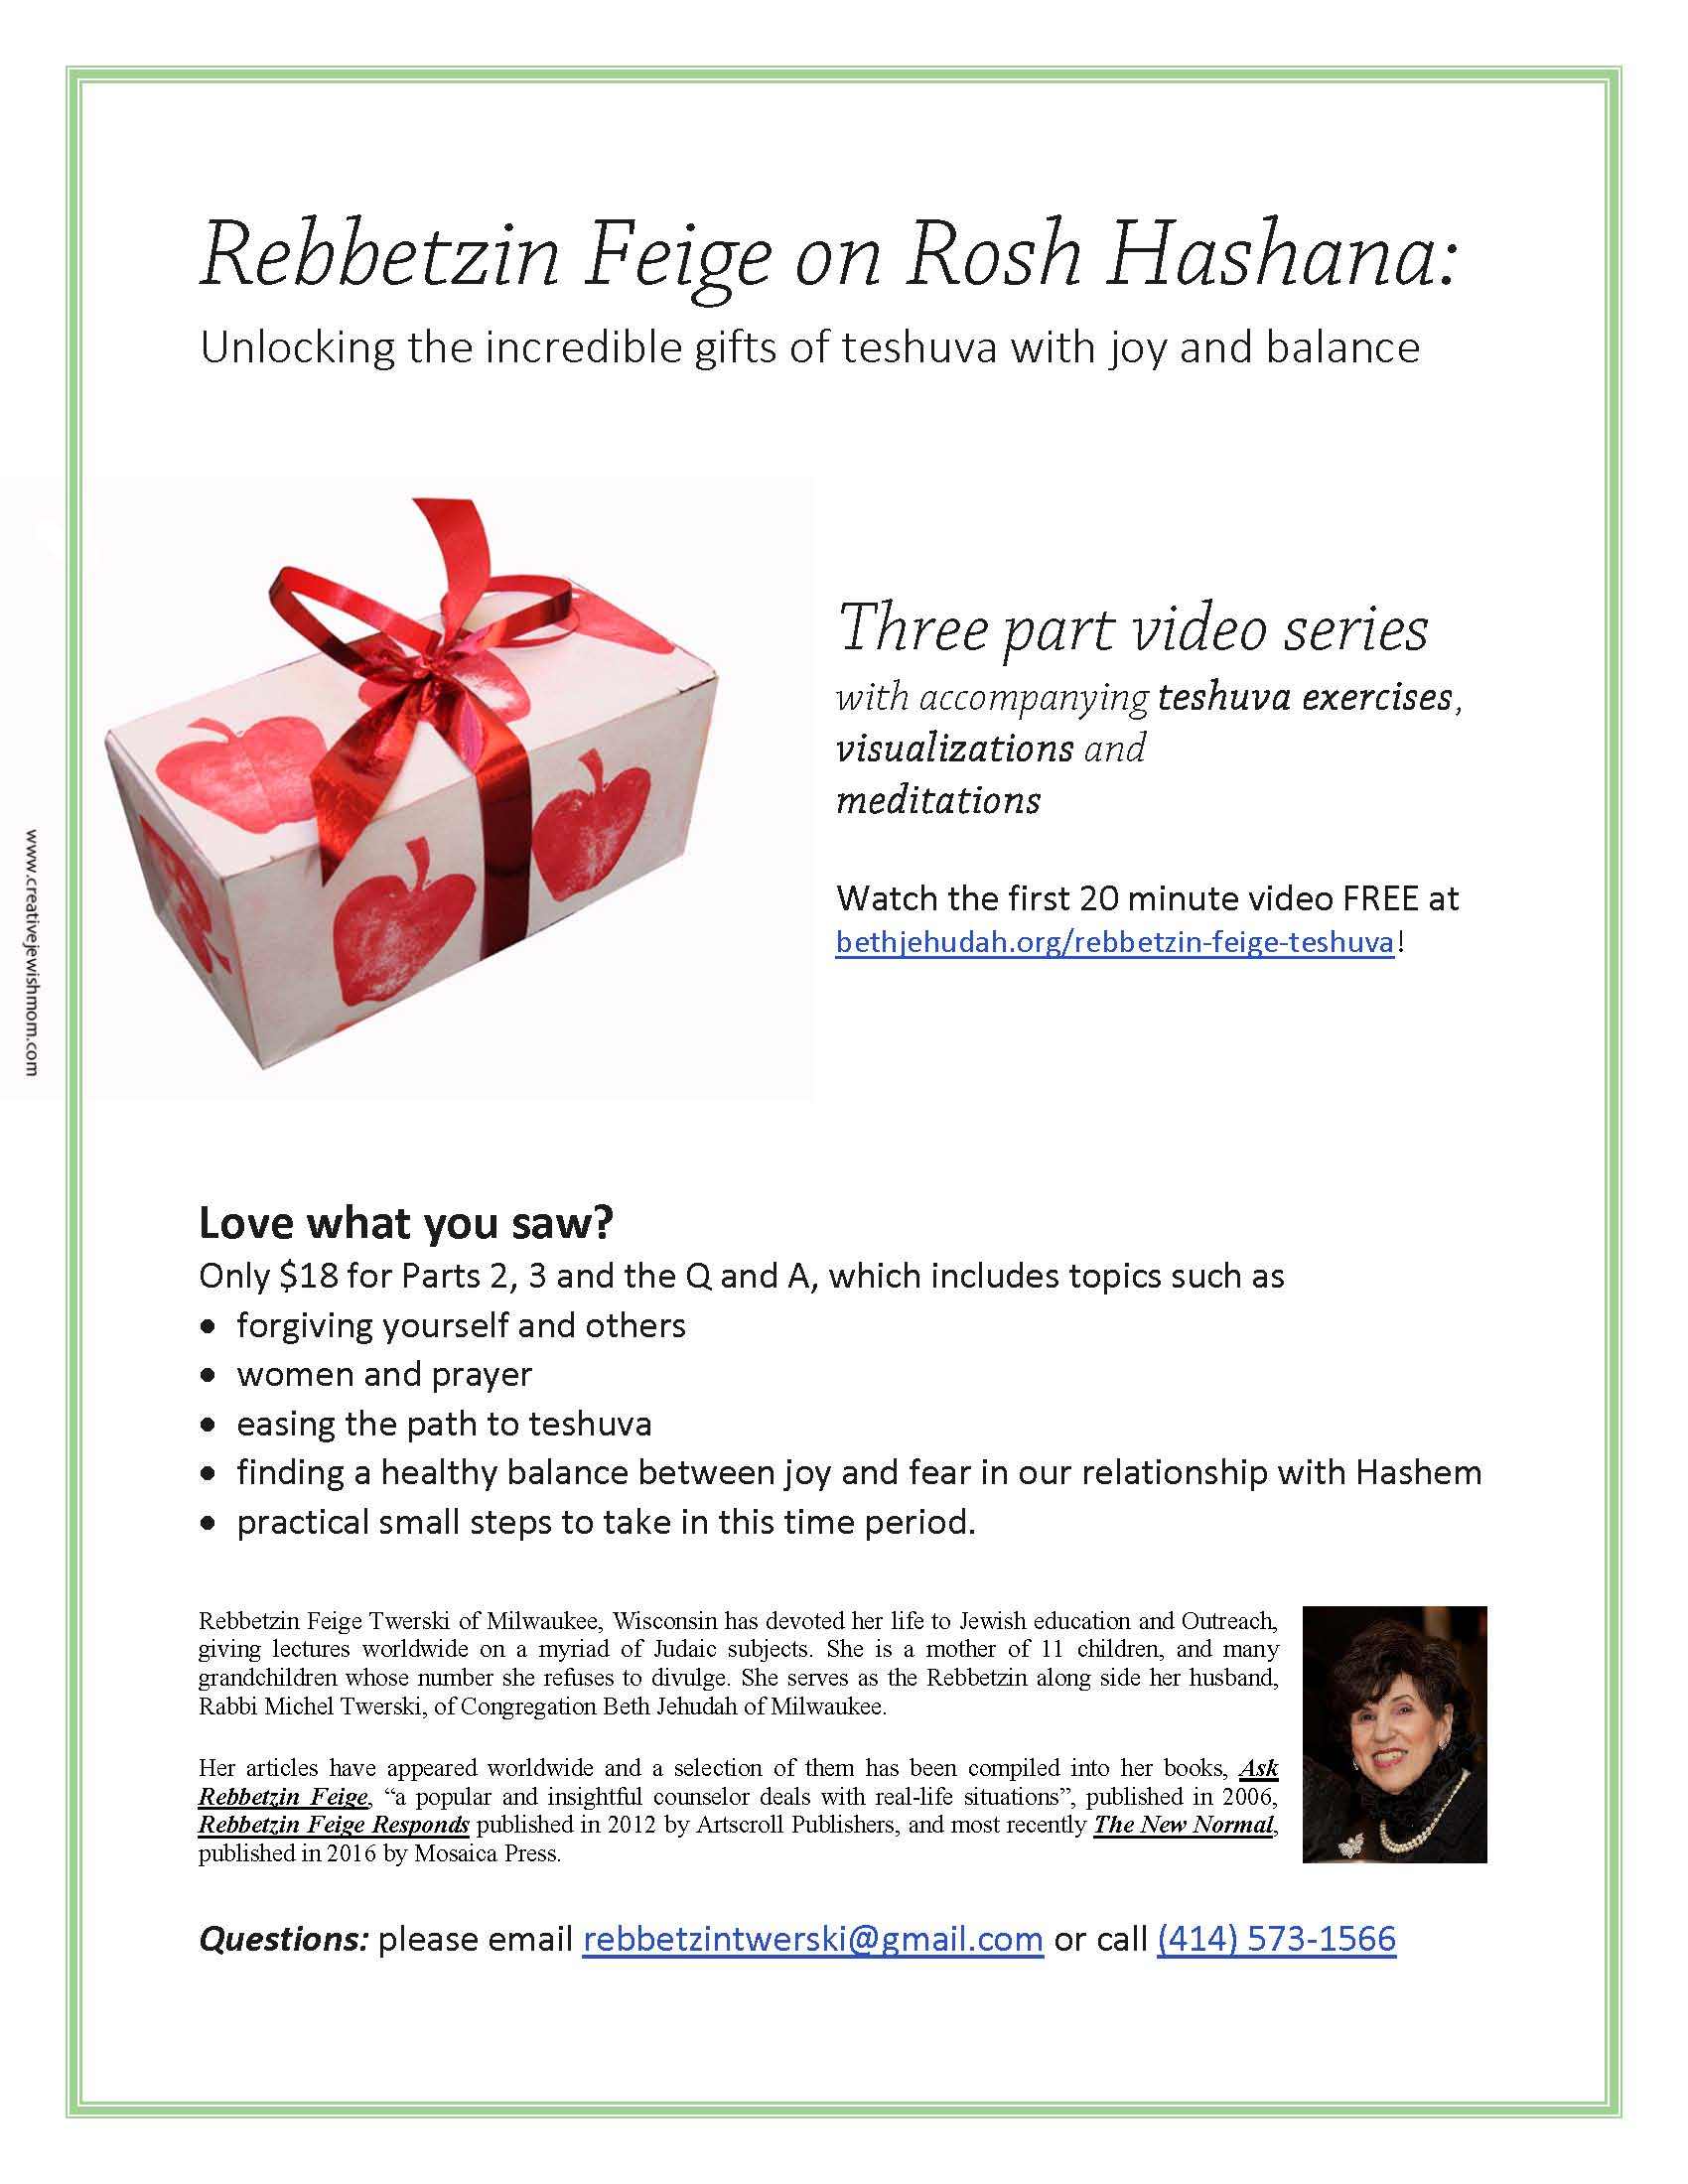 Rebbetzin Feige Twerski on Rosh Hashanah